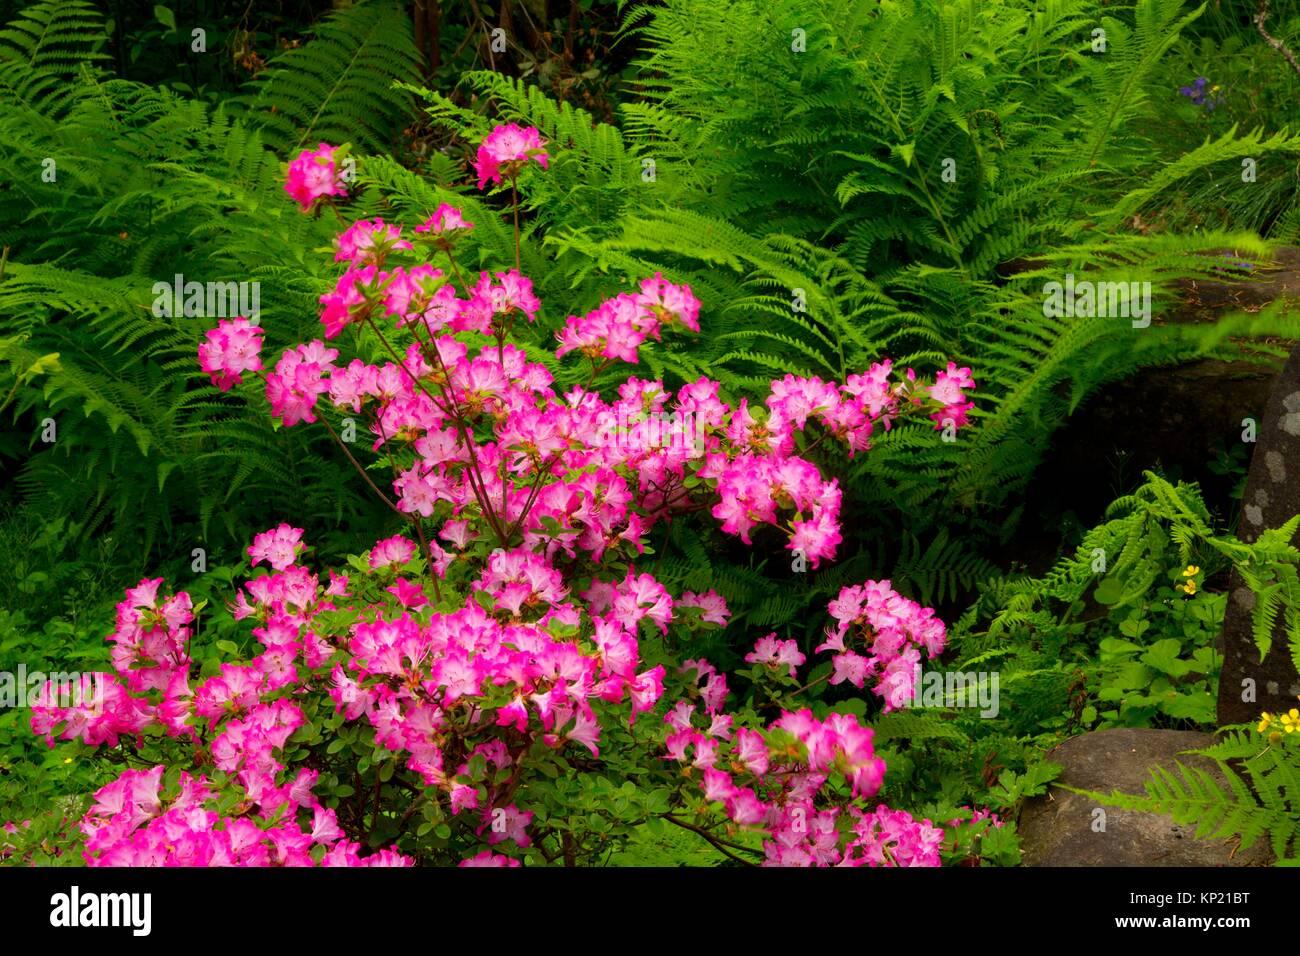 Azalea bloom, Rhododendron Garden, Hendricks Park, Eugene, Oregon. - Stock Image